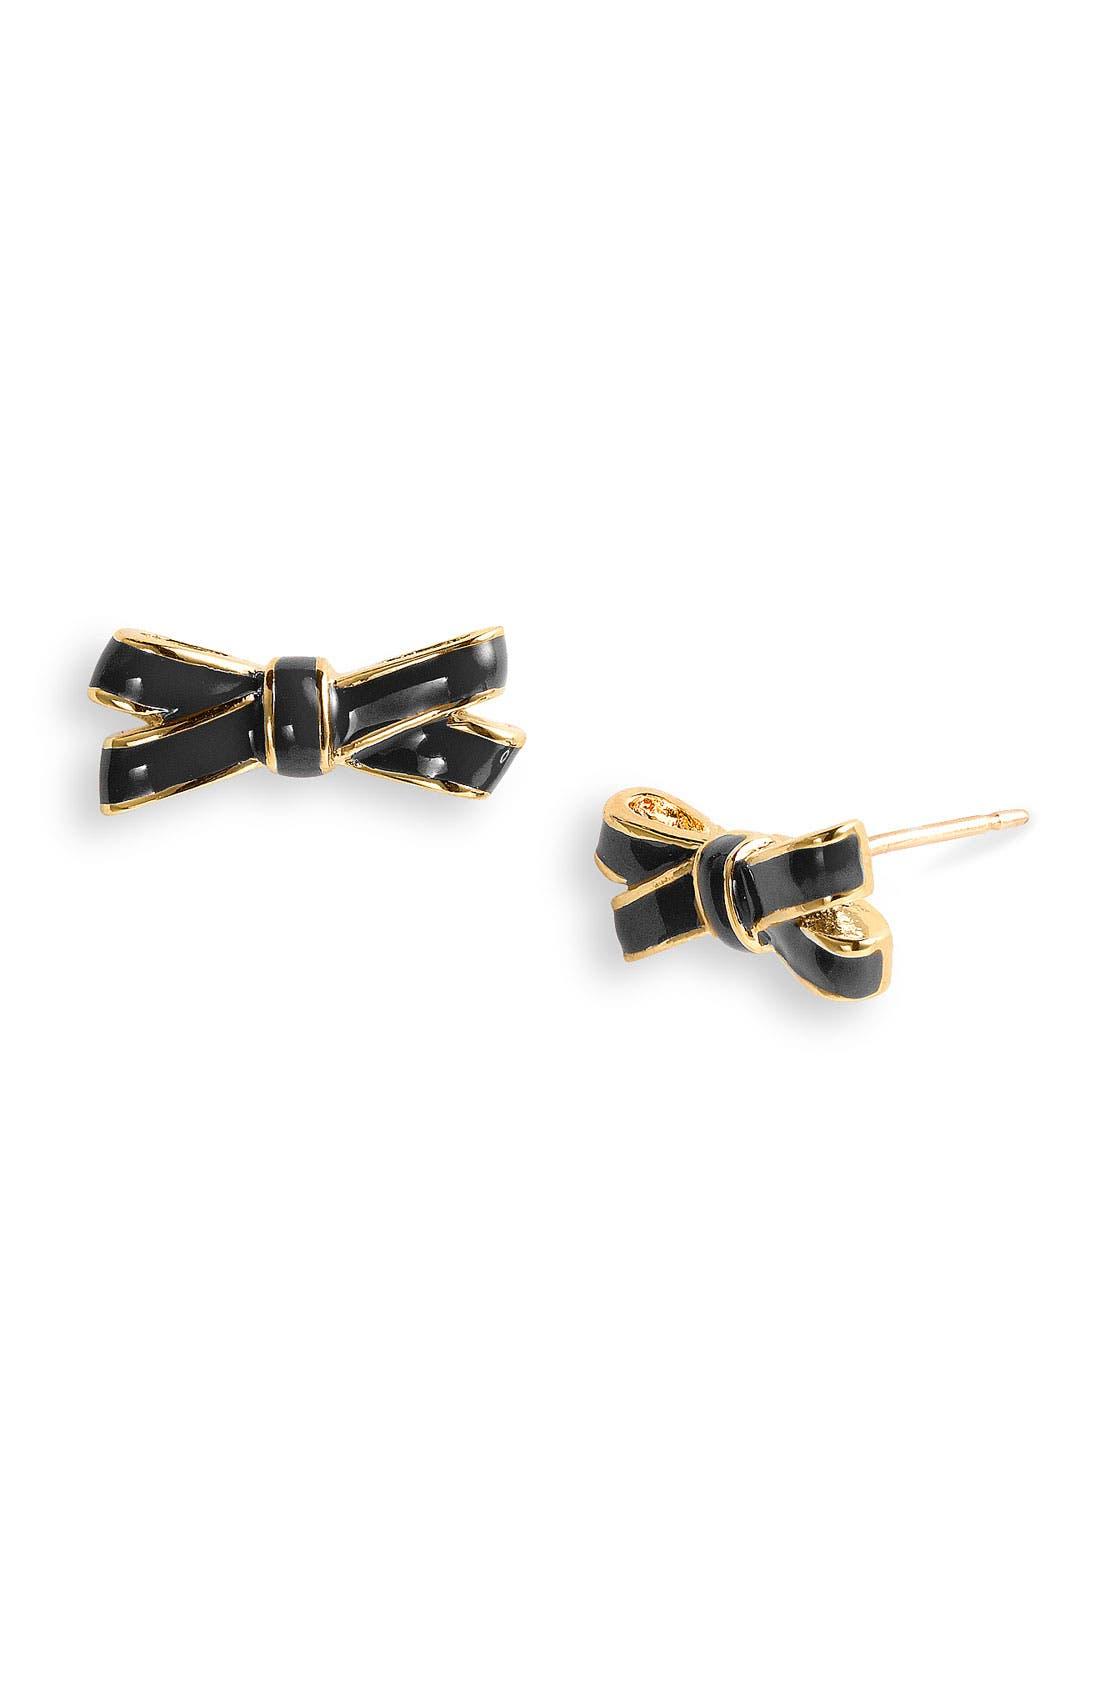 Main Image - kate spade new york double bow stud earrings